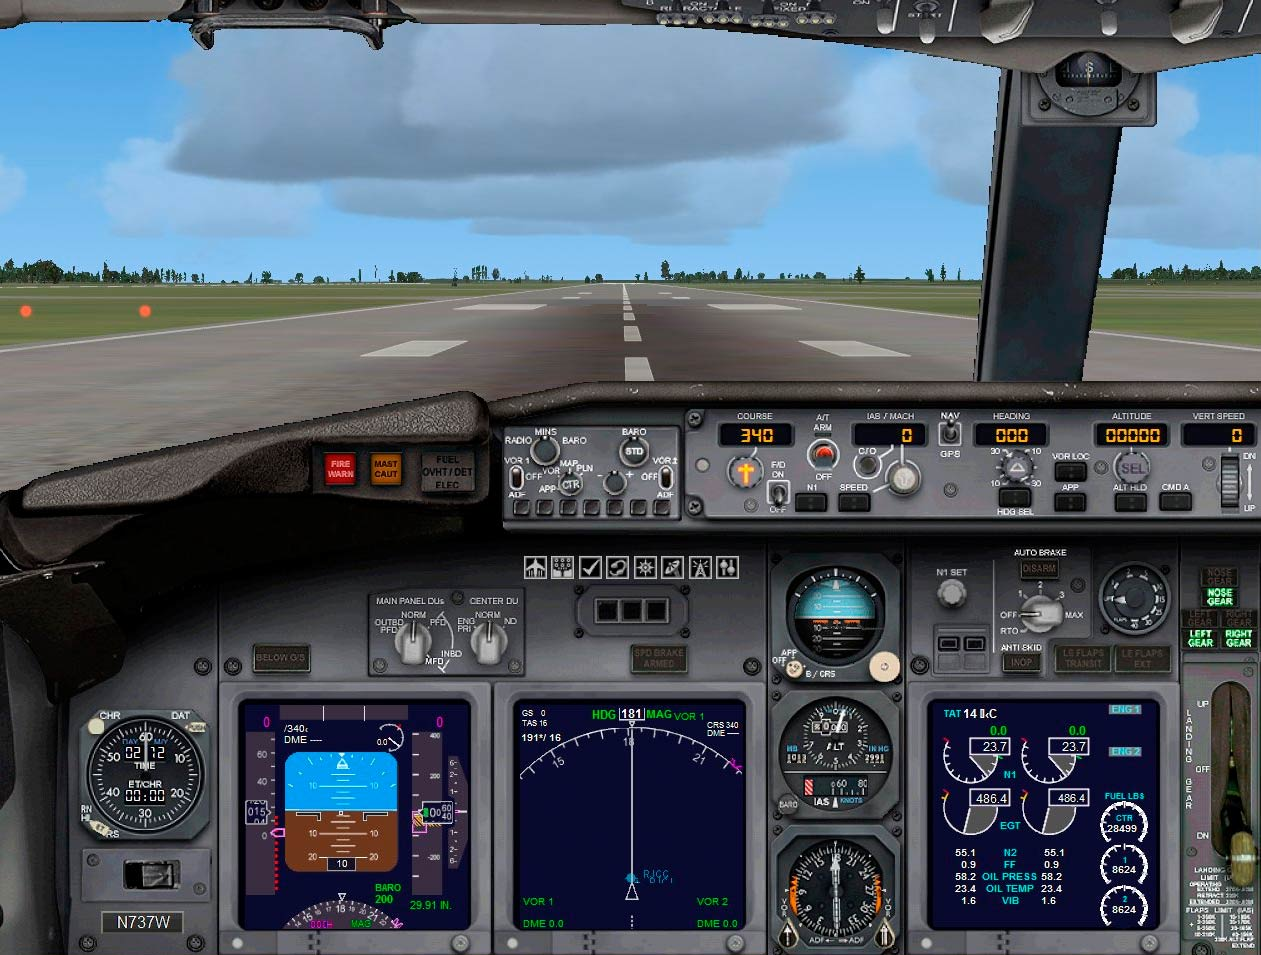 Flugsimulator Spiele